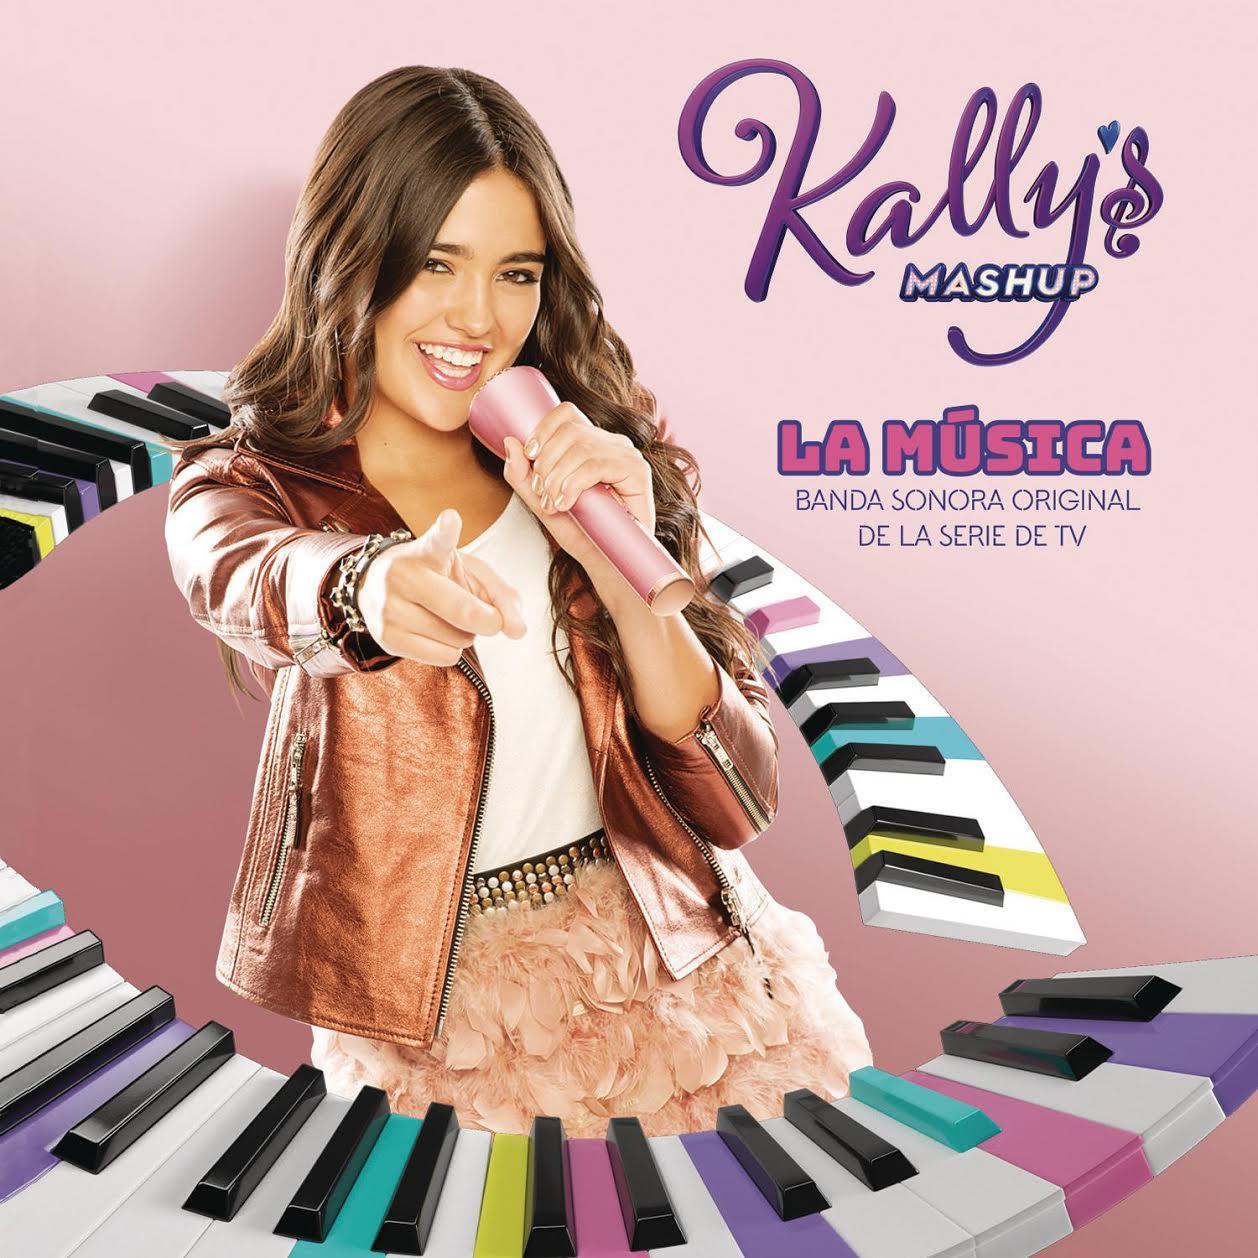 musique kally's mashup